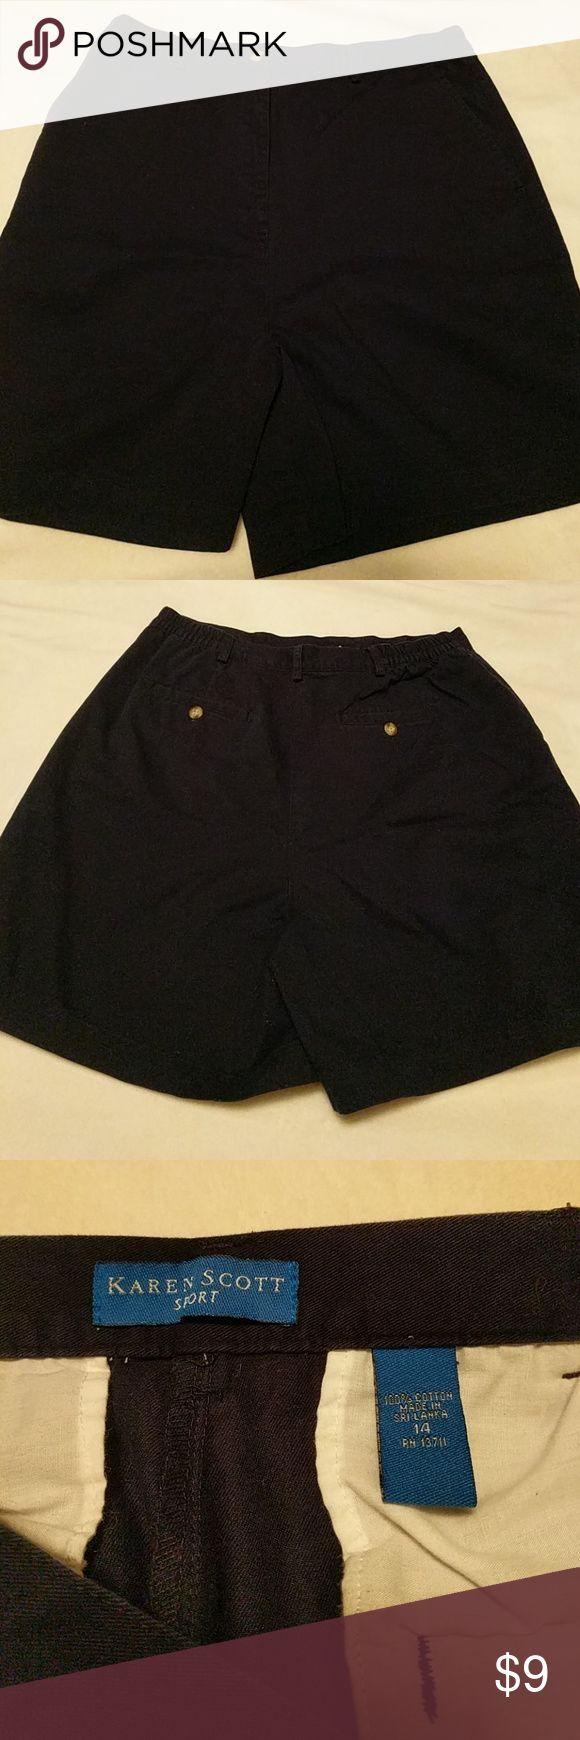 Karen scott sport navy shorts size 14 Karen scott sport navy shorts size 14 Laura Scott Shorts